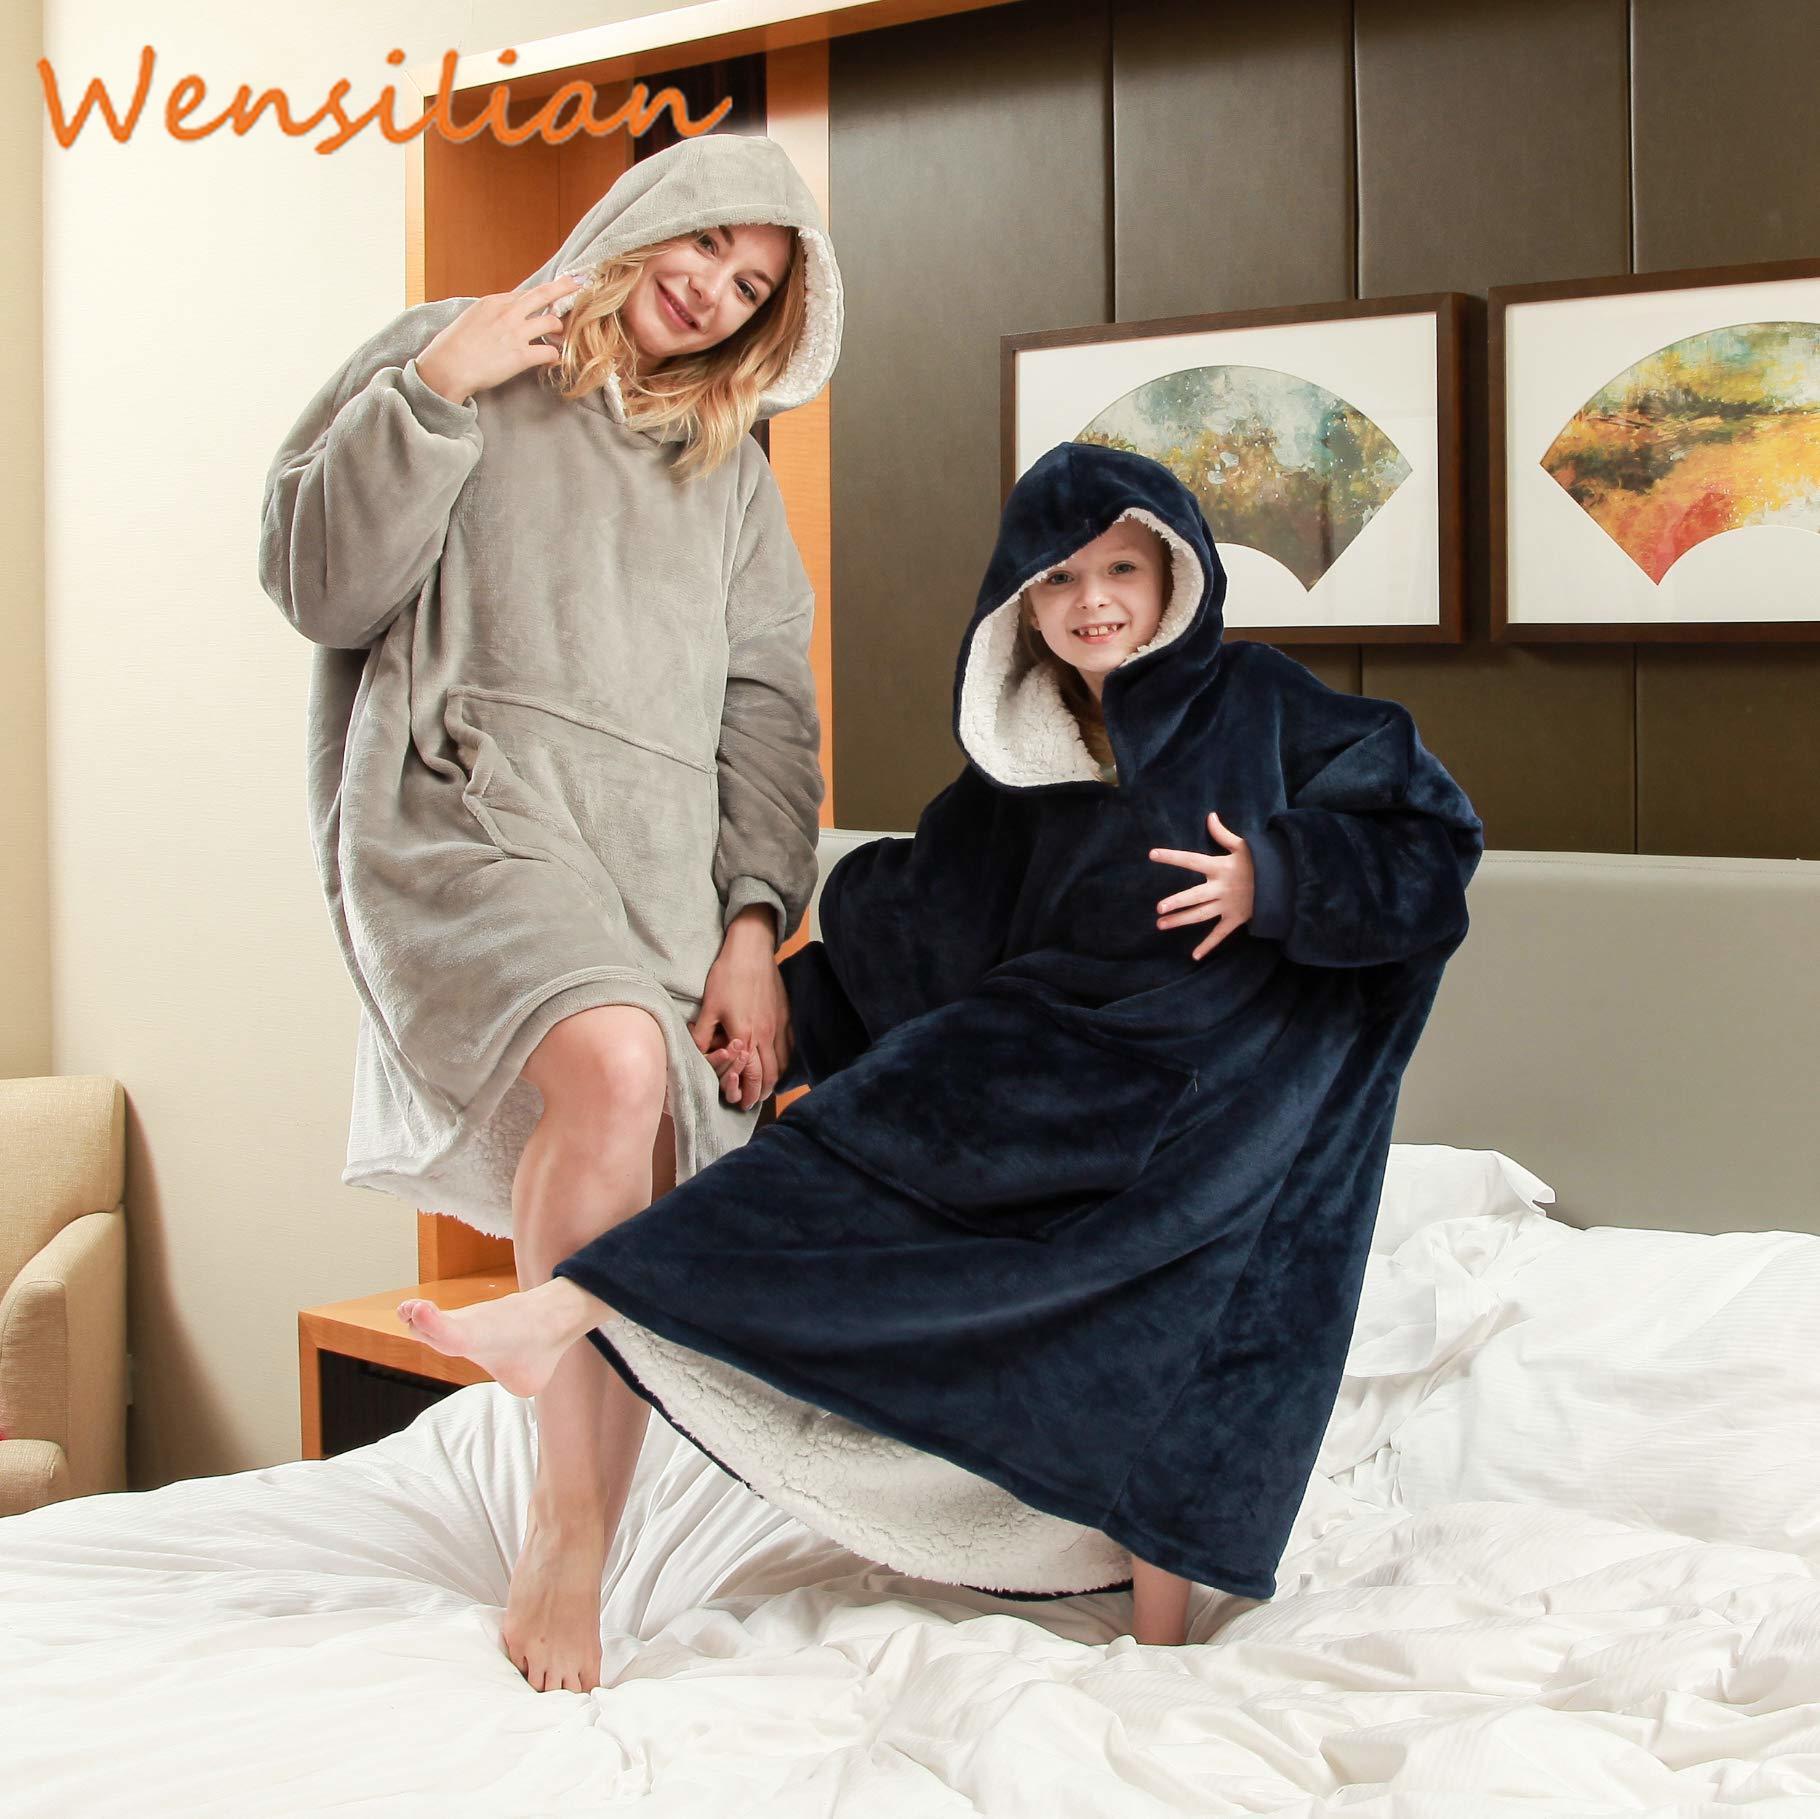 Oversized Hoodie Oversize Hooded Sweatshirt For Women Men Plaid Hoody Sweatshirt Plaid Giant Hoodies Bluza Damska Sudadera Mujer